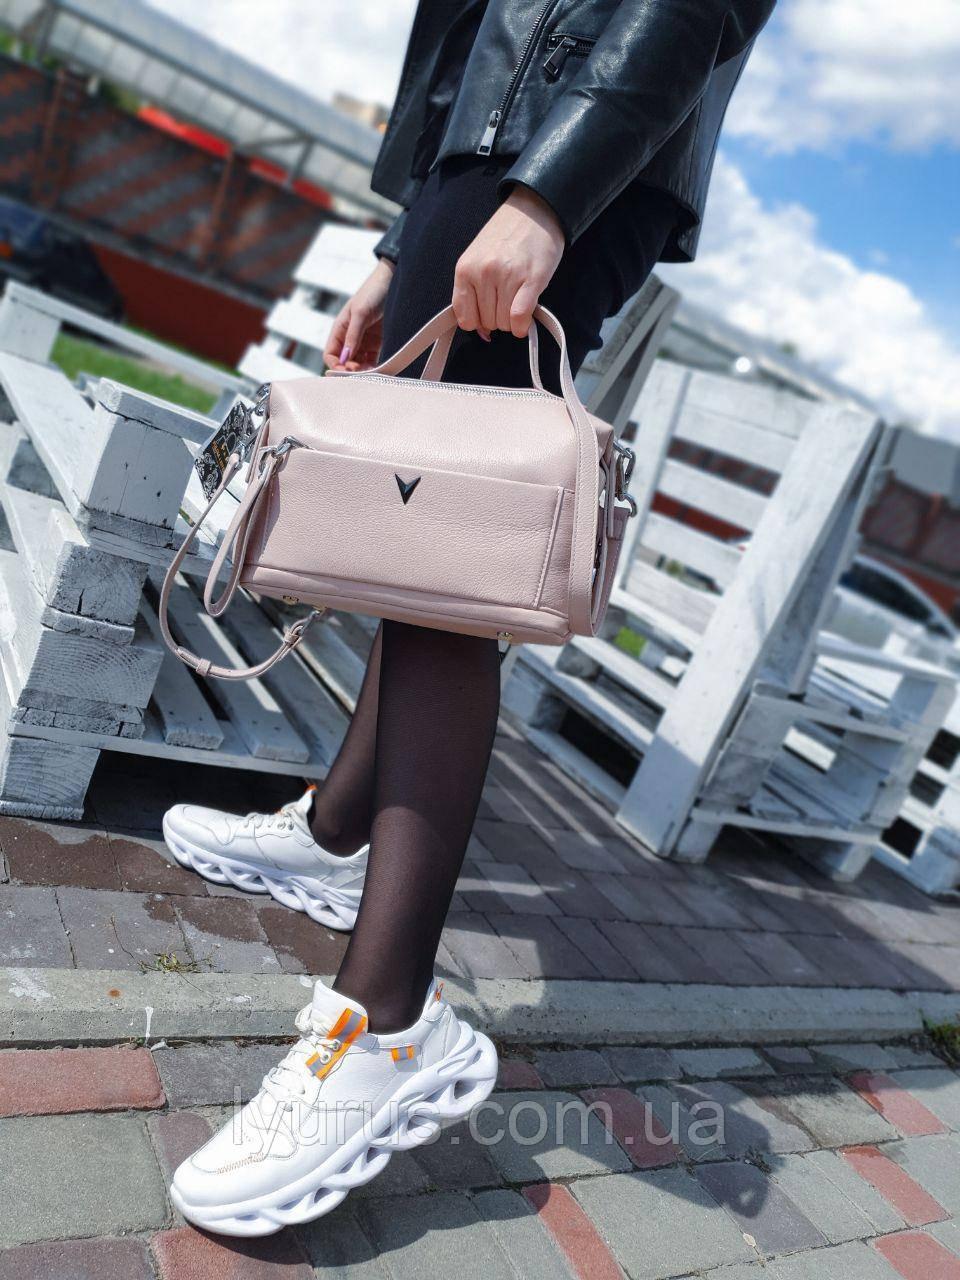 Женская кожаная сумка размером 24х16х11 см Светло-розовая (01223)